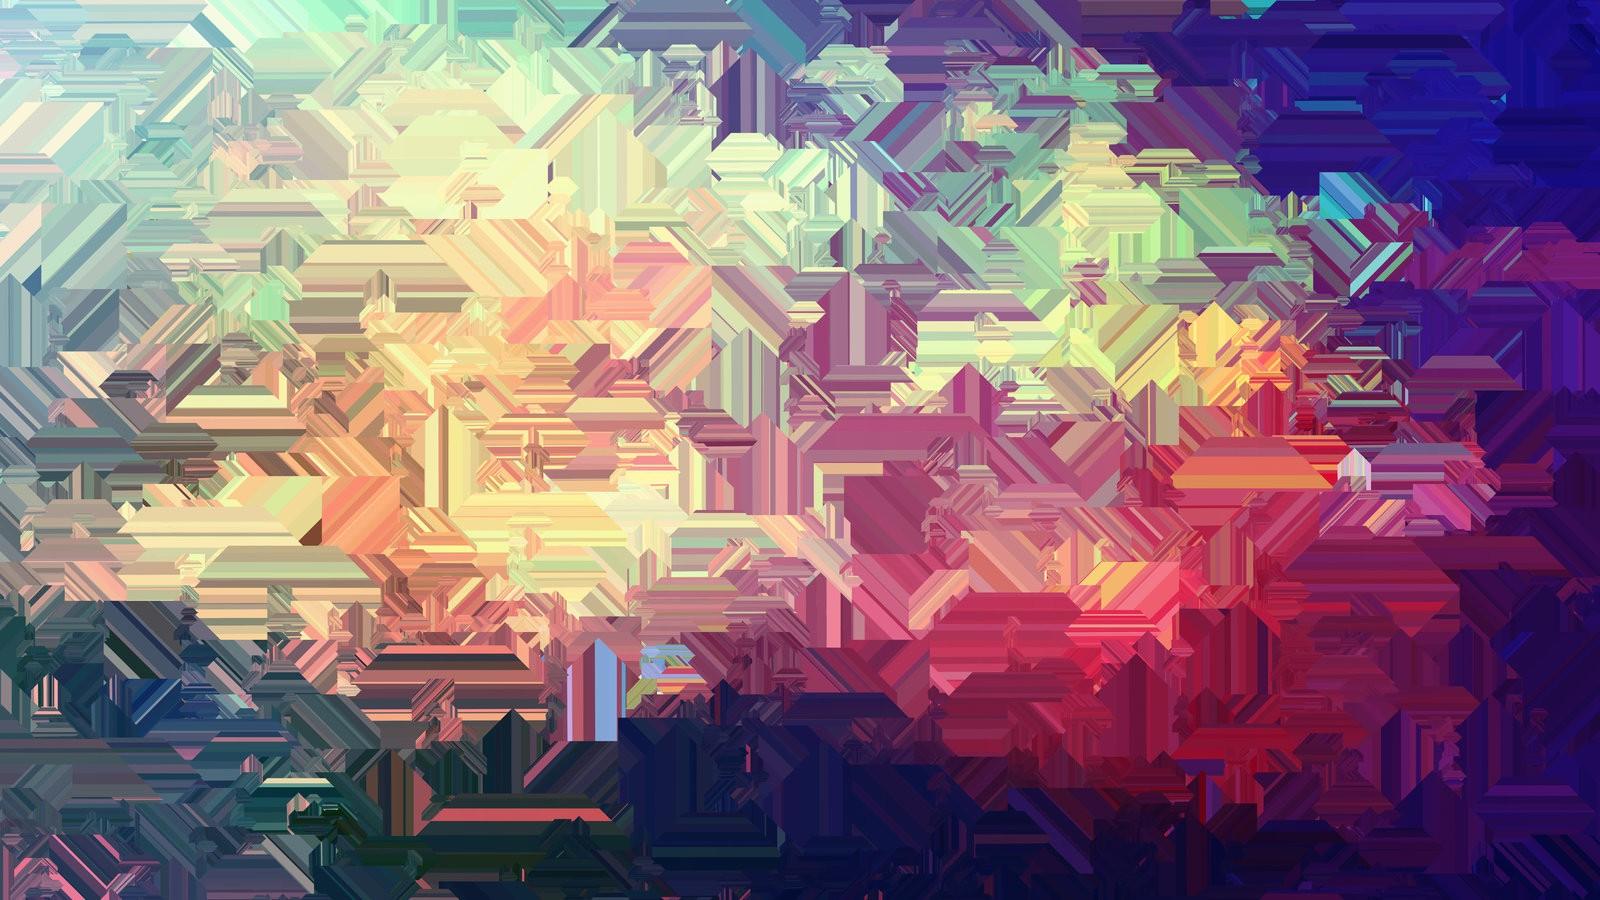 warme farben malerei, hintergrundbilder : malerei, illustration, digitale kunst, abstrakt, Innenarchitektur